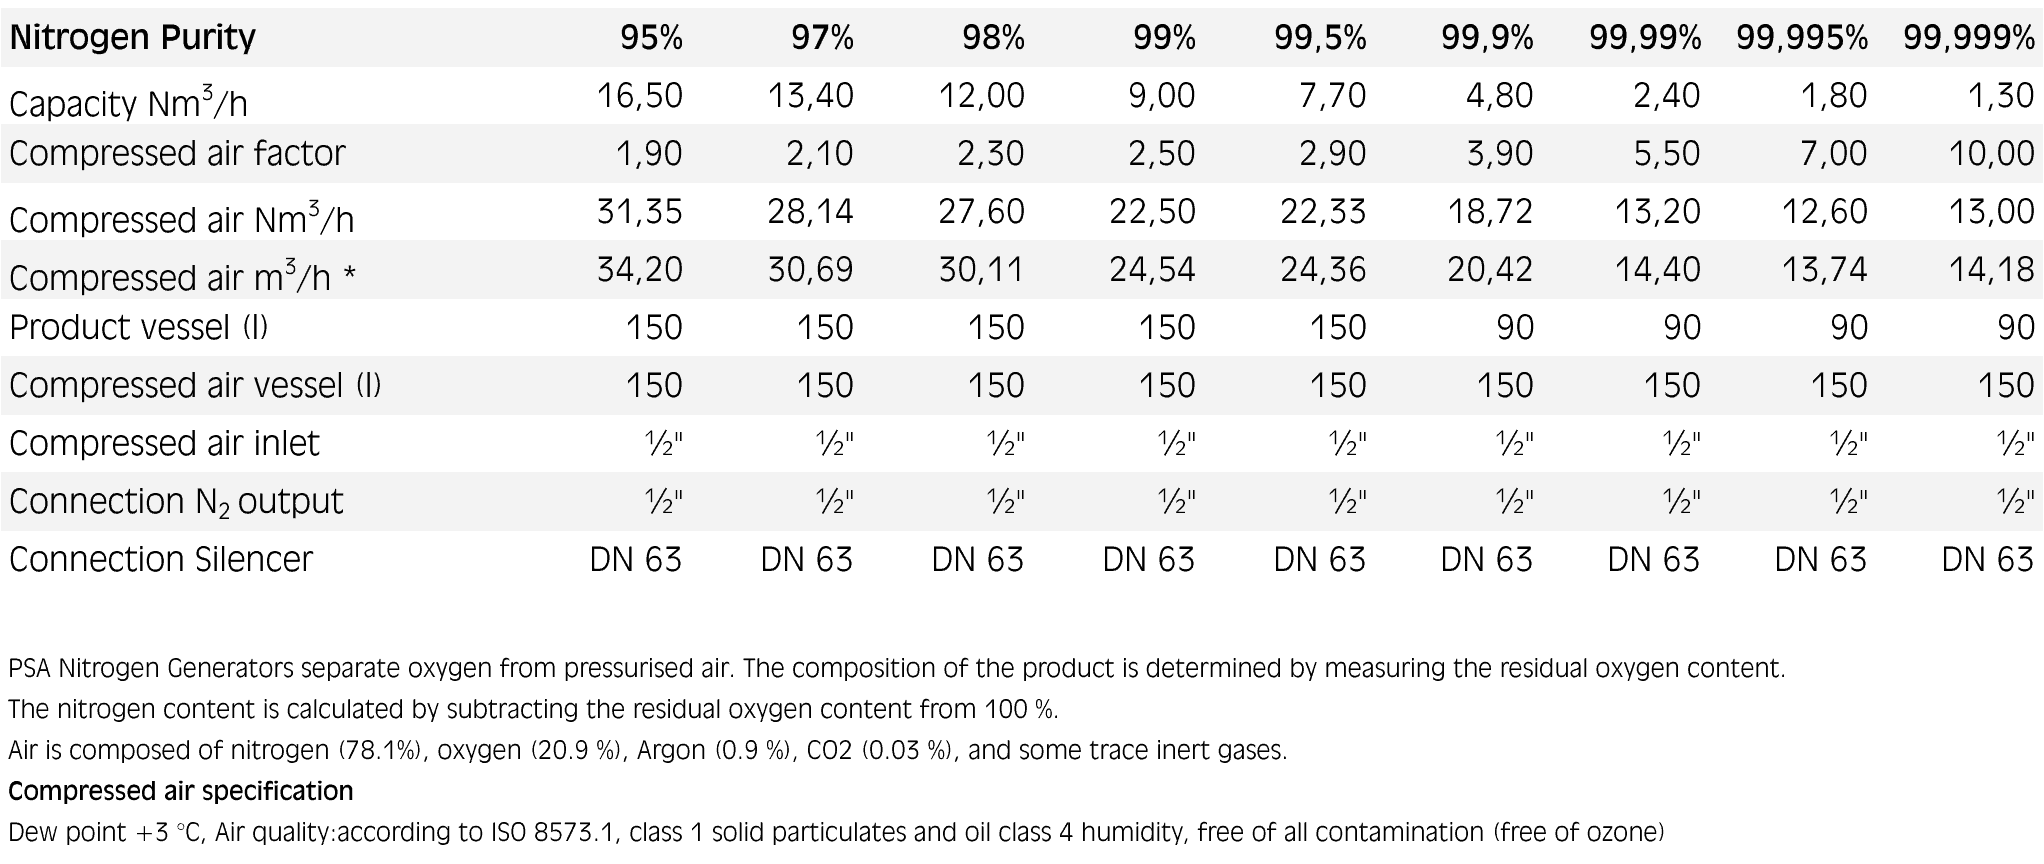 NIG PNOG 1280 parameters tab - NIG-PNOG-1280 PN OnGo Nitrogen Generator 1.3 - 16.5 m3 N2 per hour